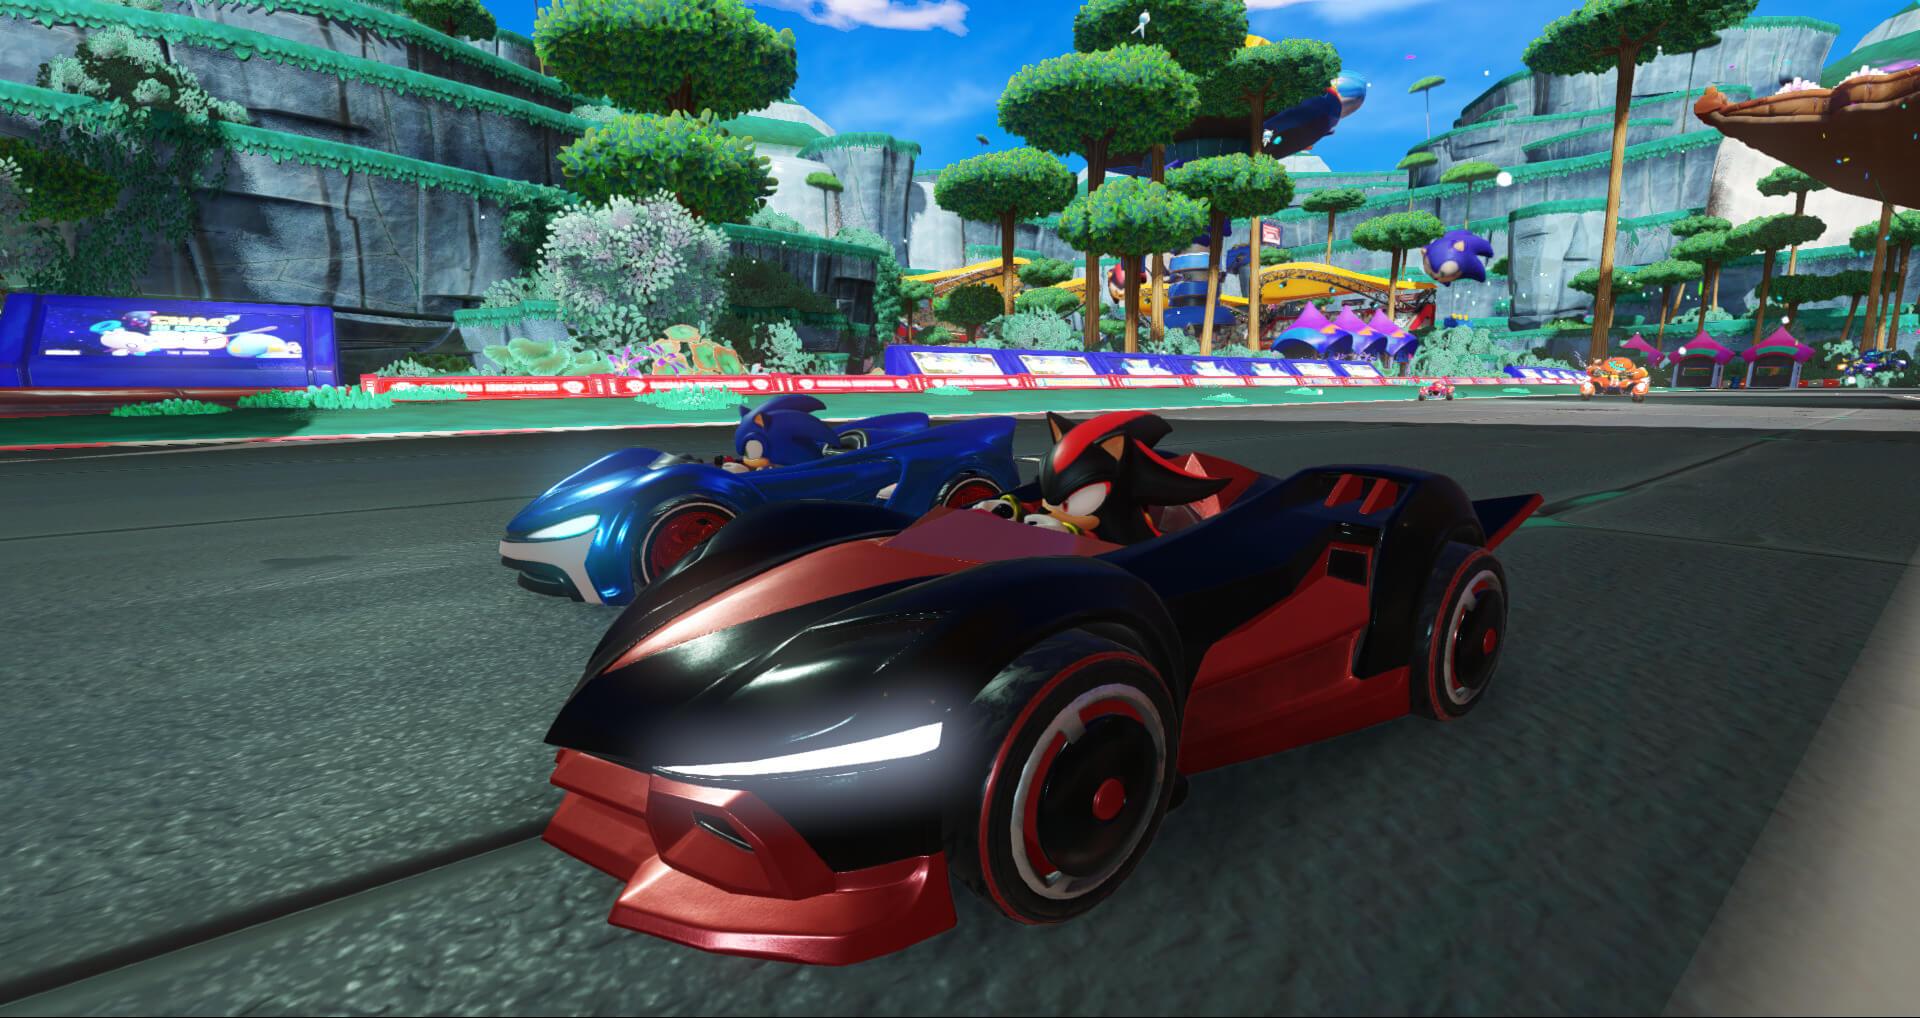 https://www.dsogaming.com/wp-content/uploads/2018/05/Team-Sonic-Racing-1.jpg